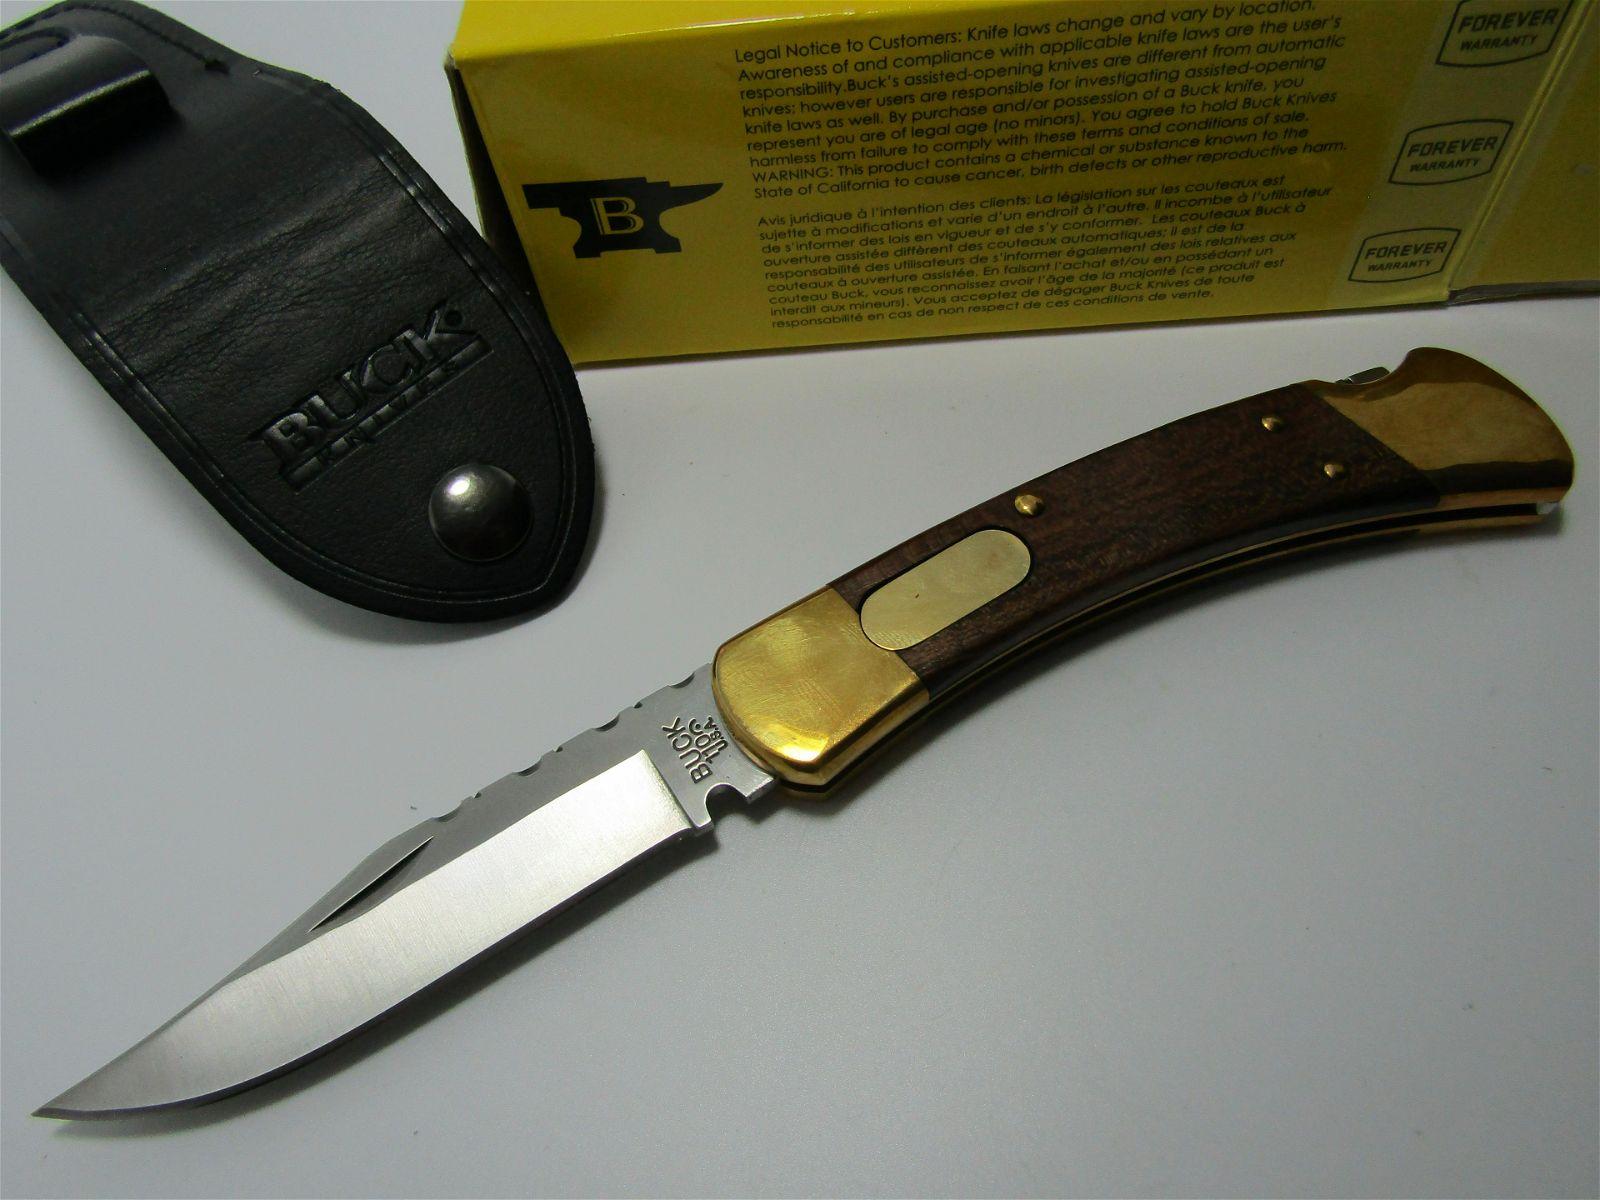 BUCK SWITCHBLADE POCKET KNIFE